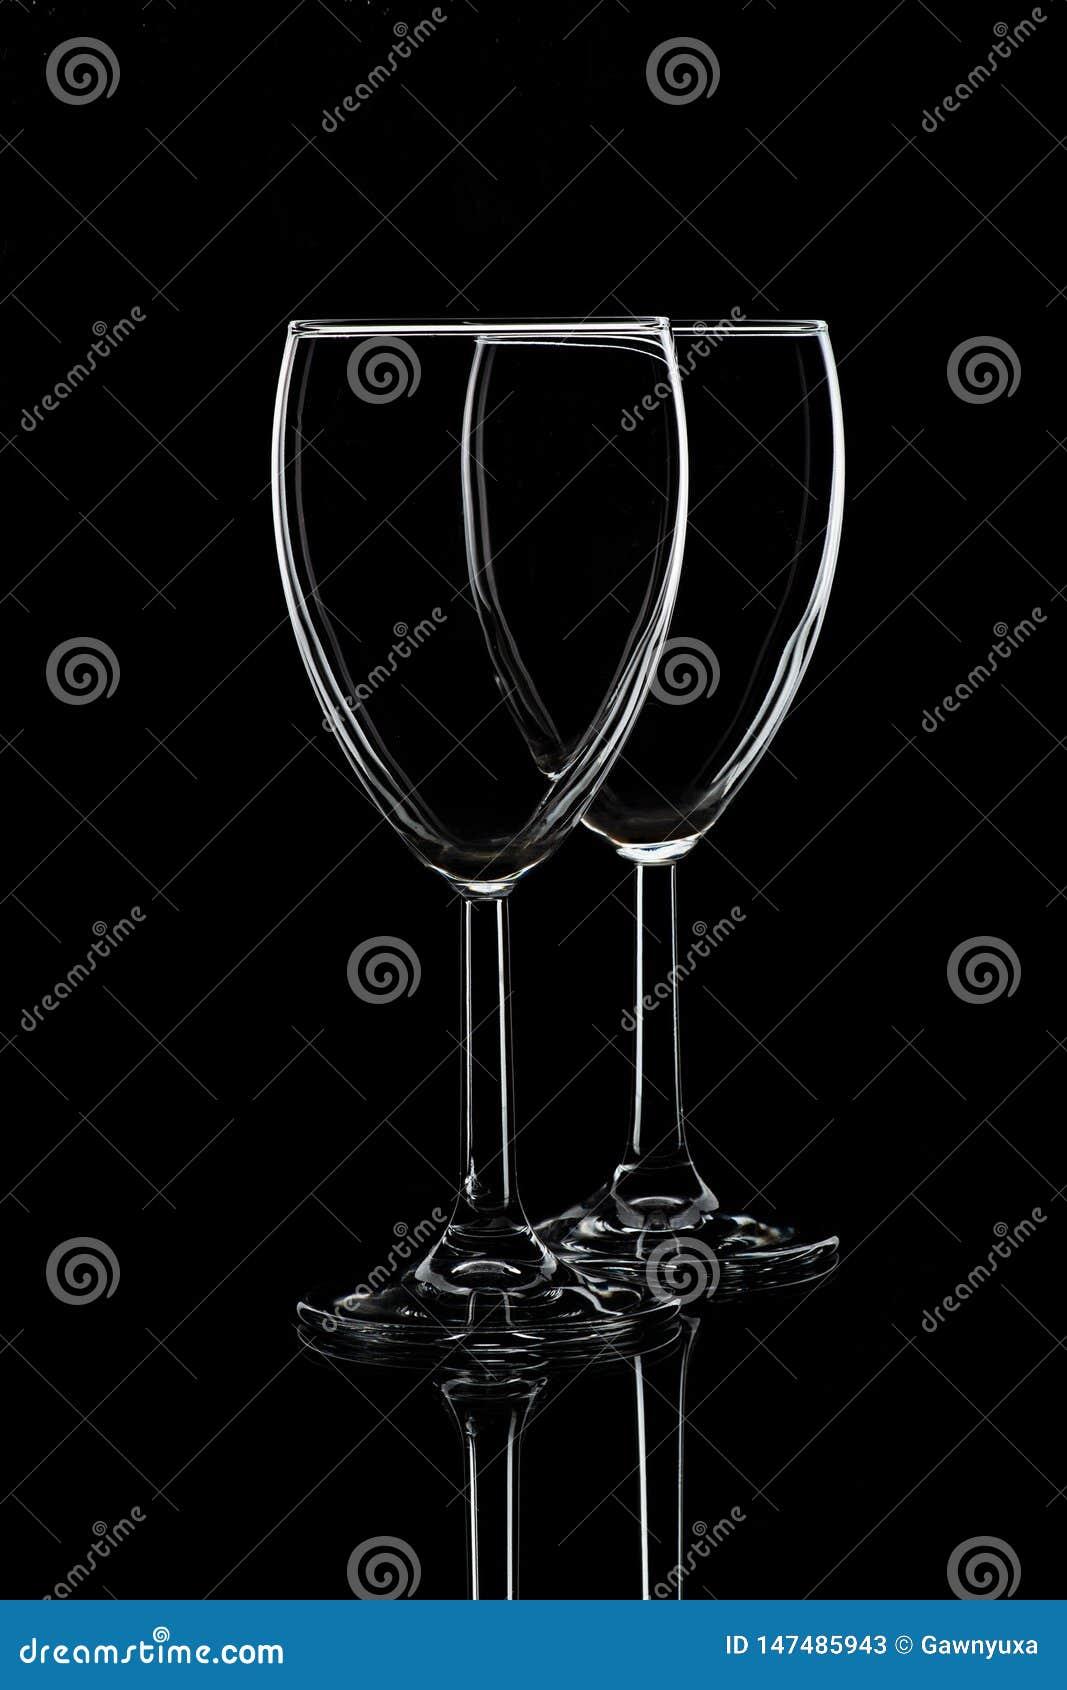 Verre, verres, champagne, vacances, alcool